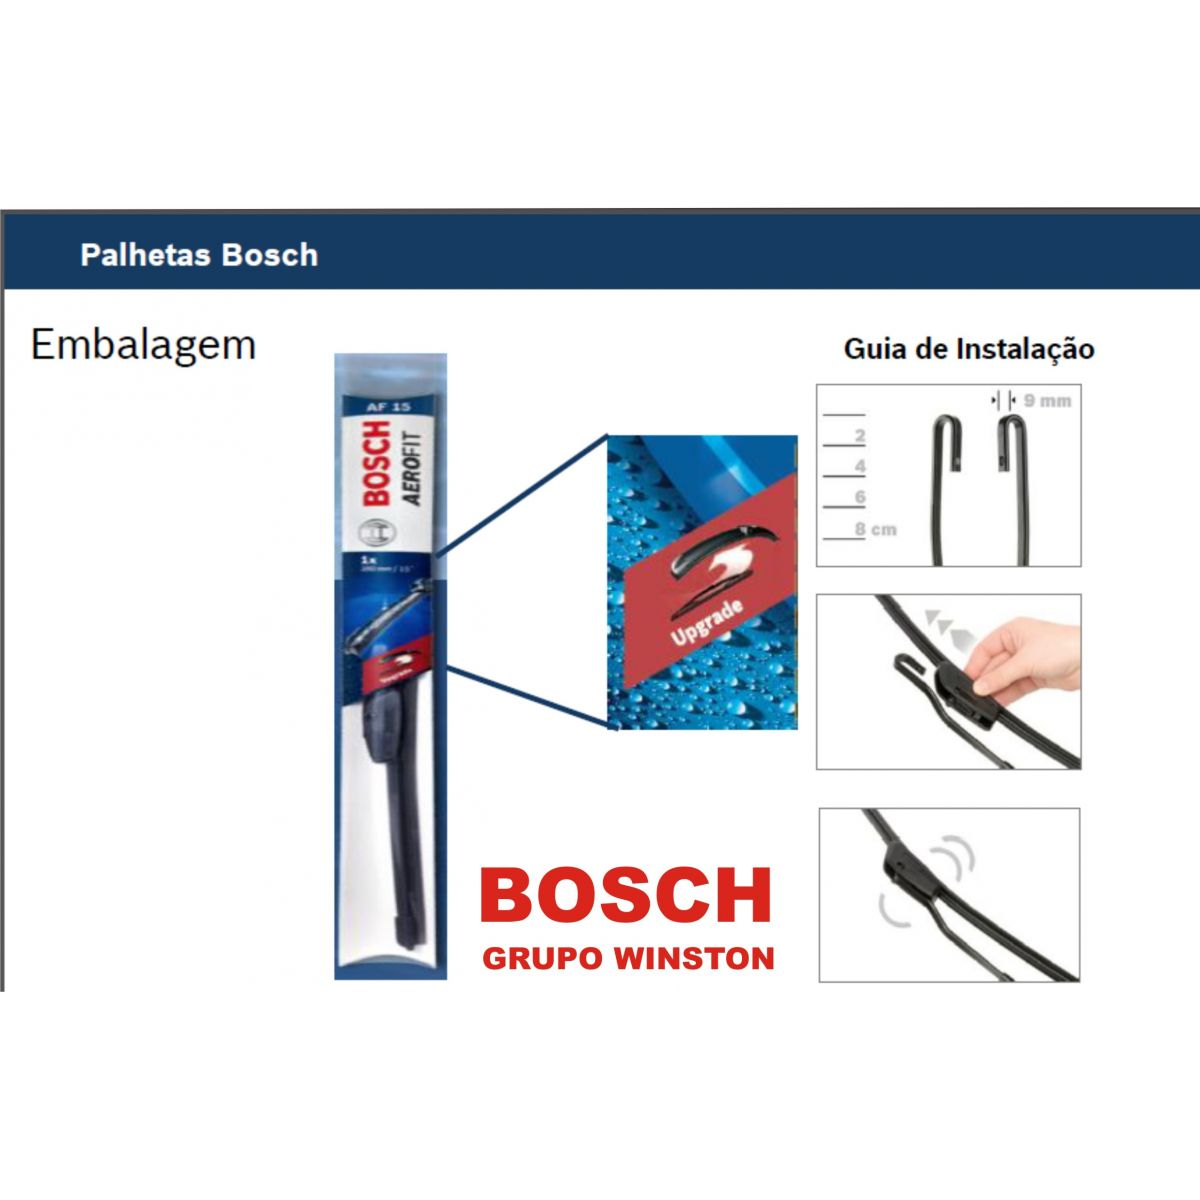 Palheta Bosch Aerofit Limpador de para brisa Bosch JAC J3 Turin